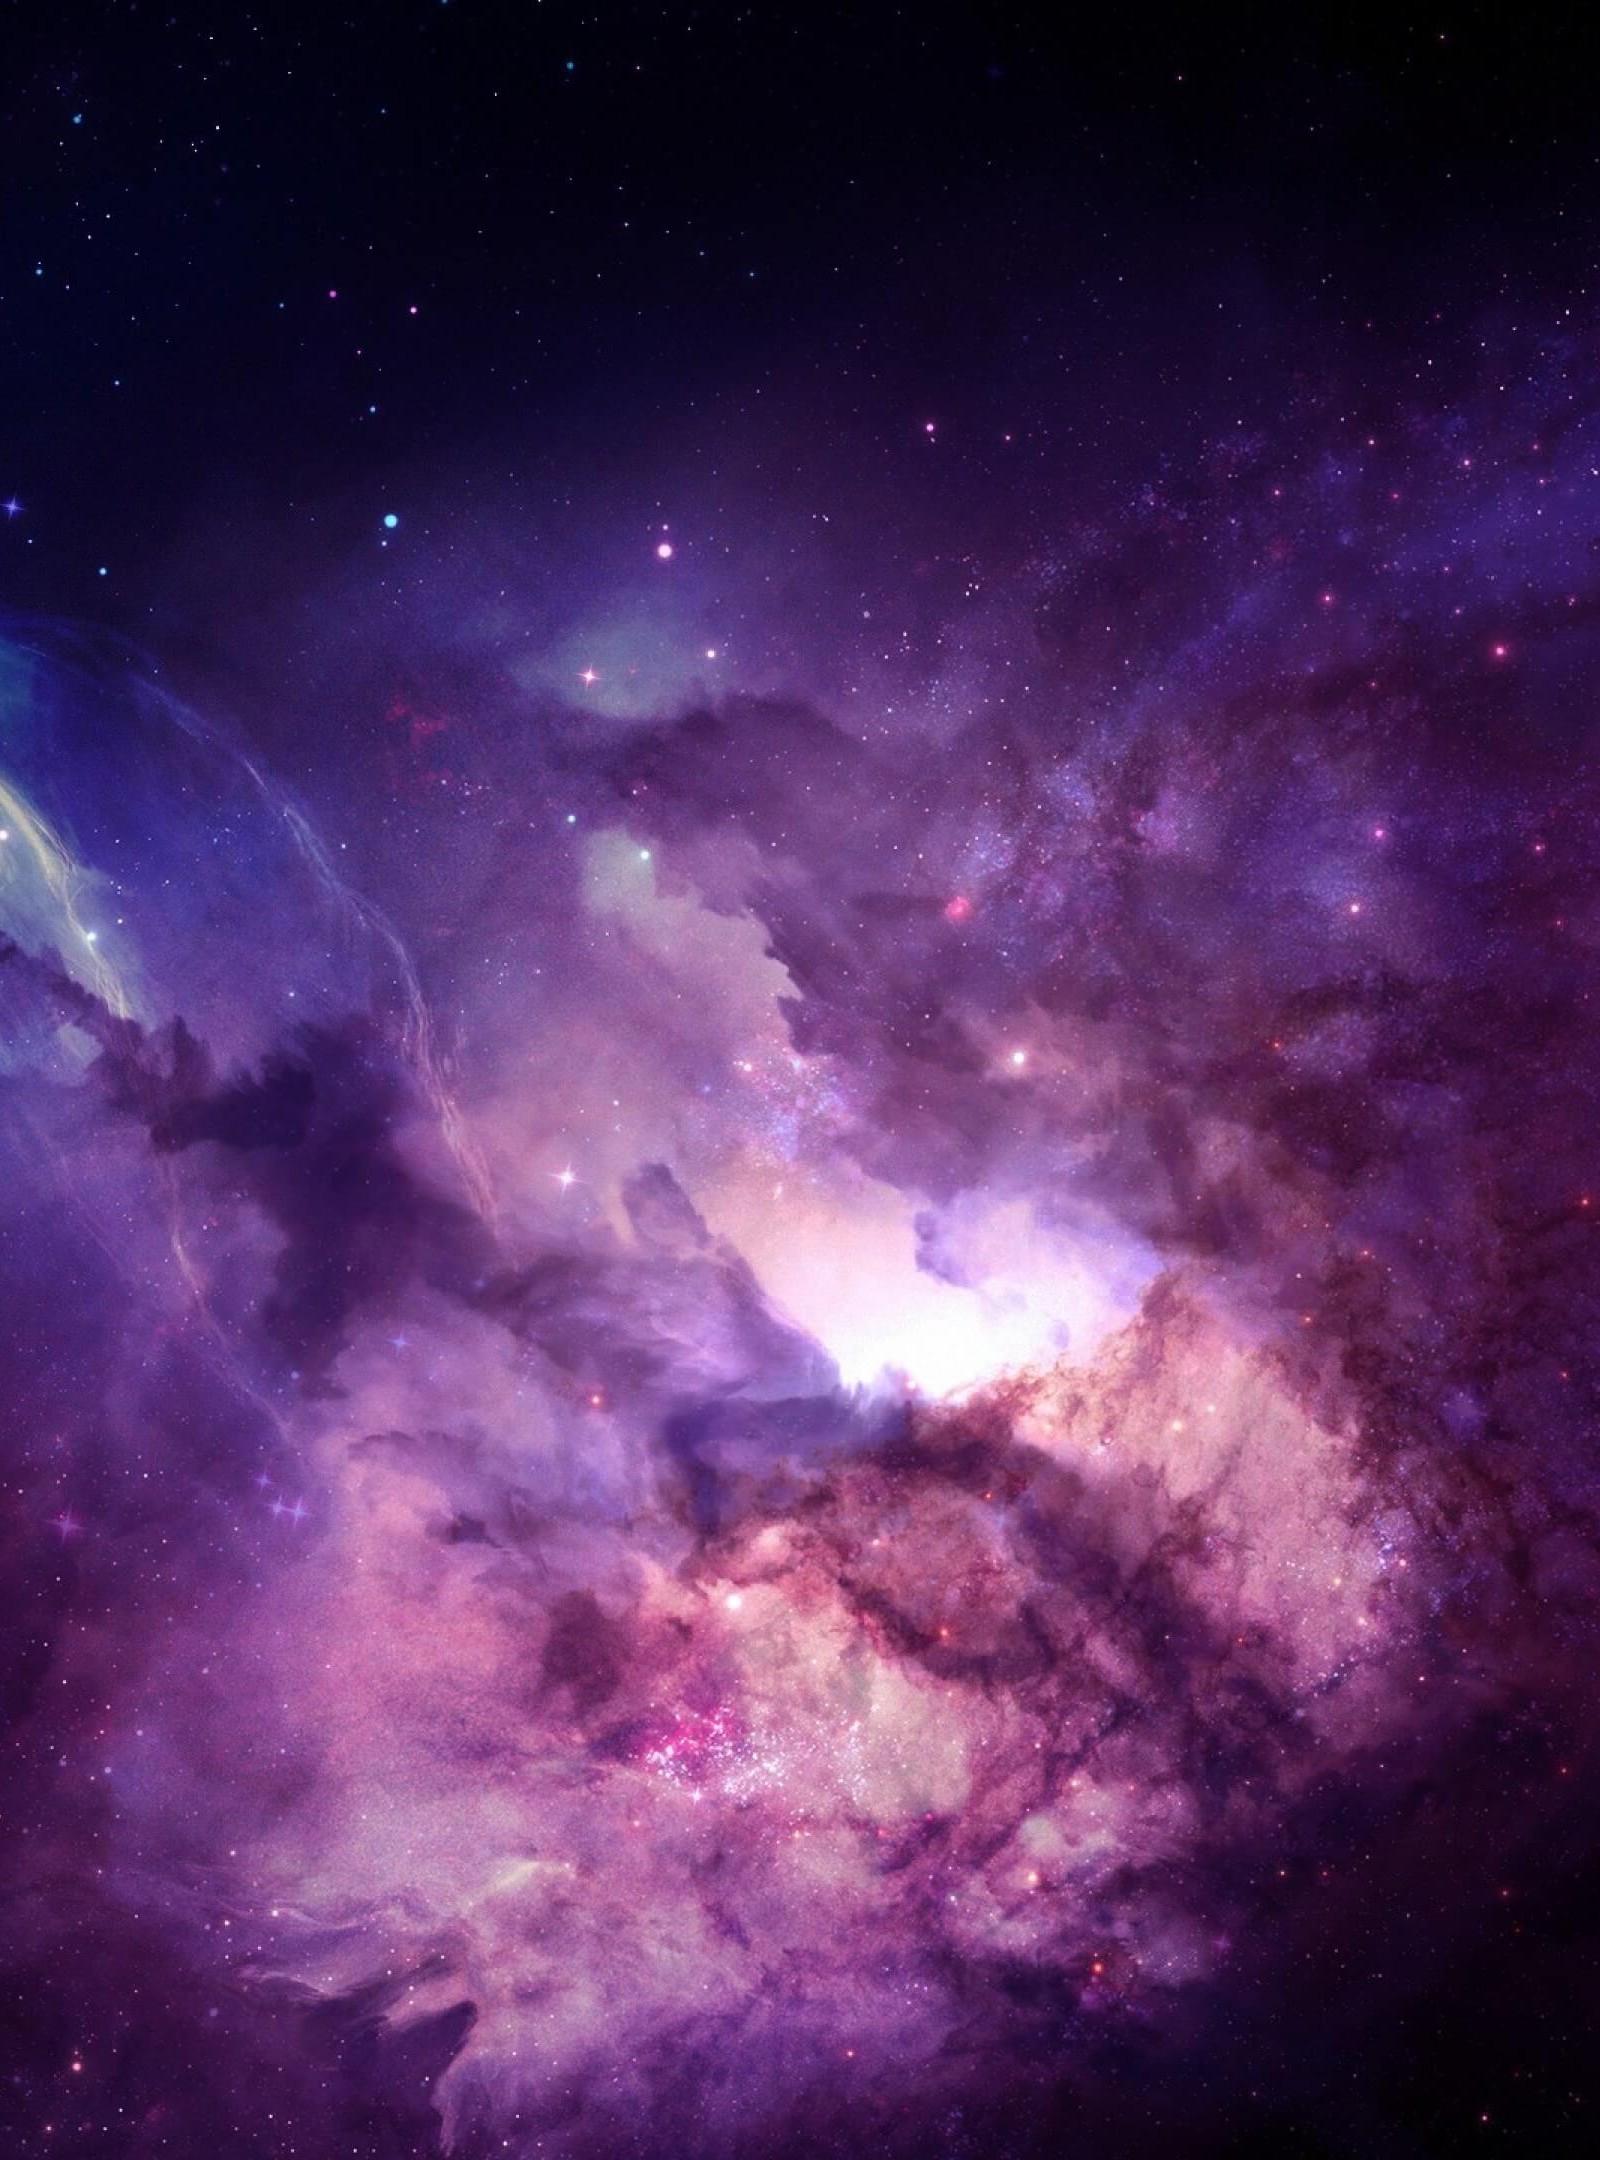 purple nebula wallpaper for kindle fire hdx 89 109 712jpg 1600x2160